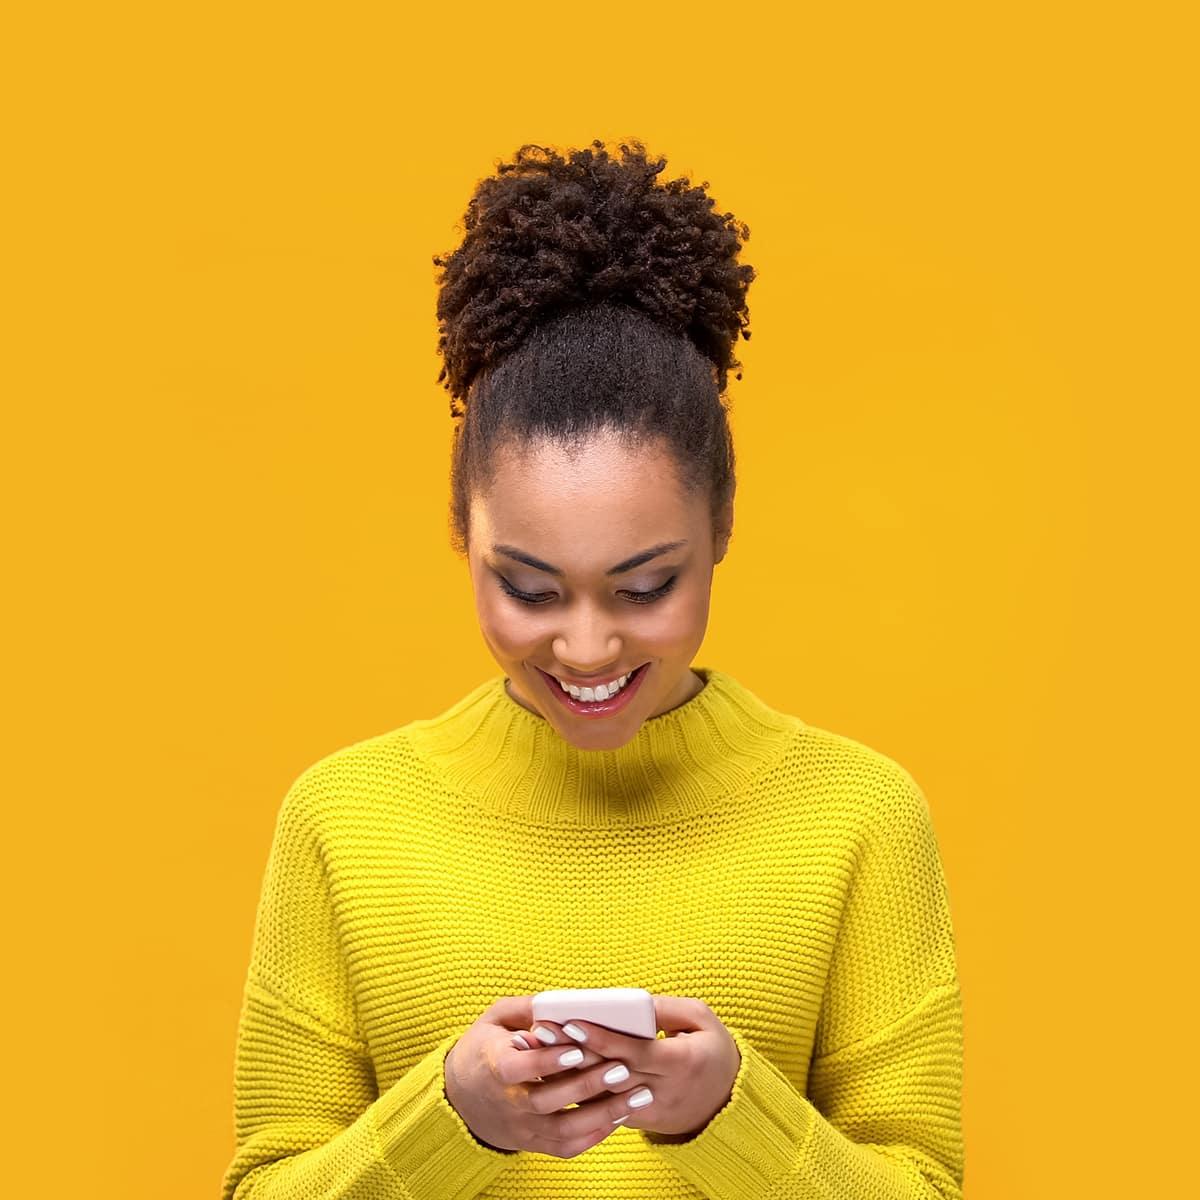 Woman looks at phone screen